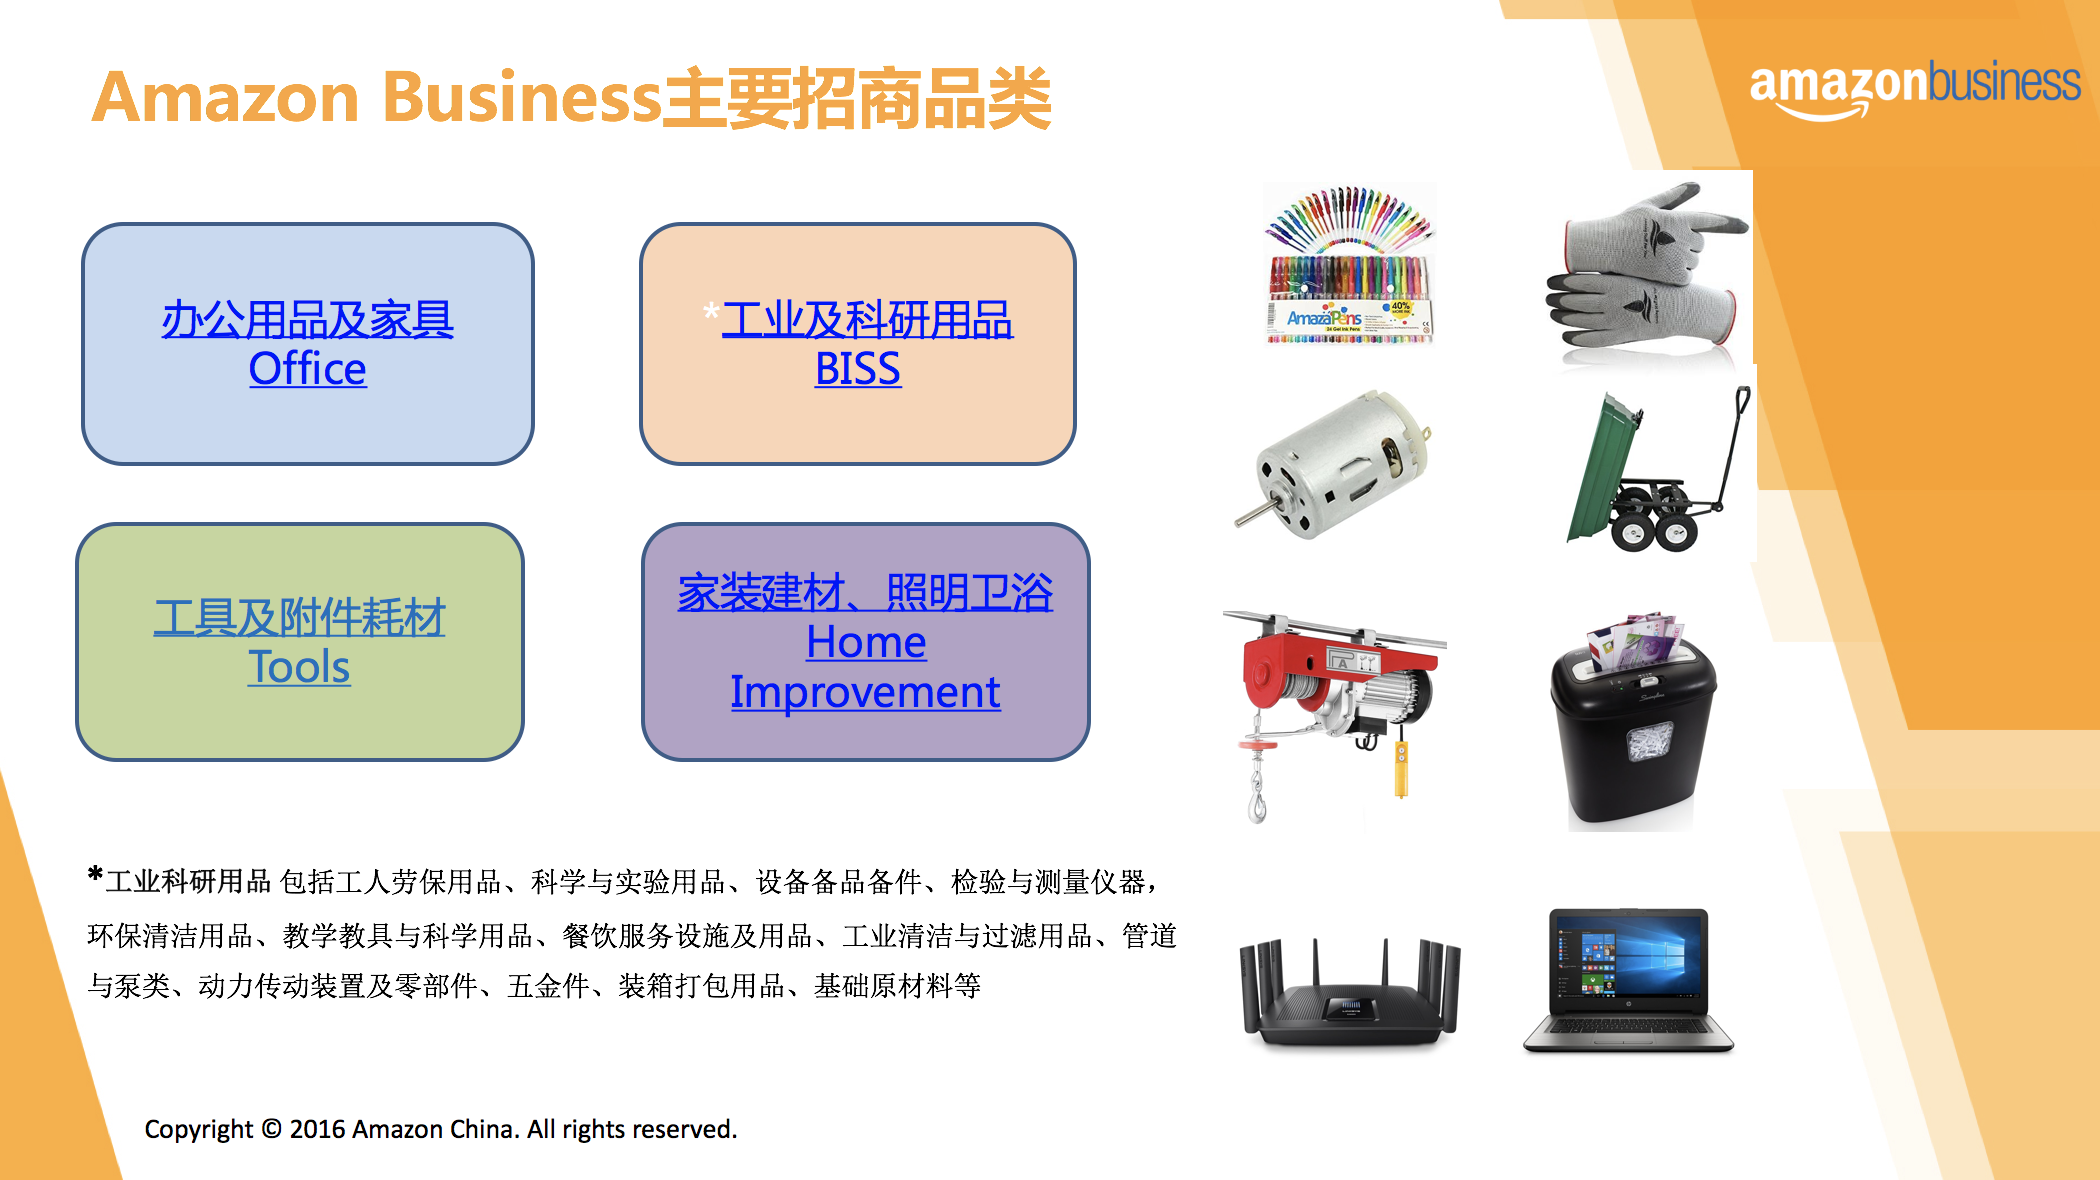 入驻亚马逊-Amazon Business主要招商品类